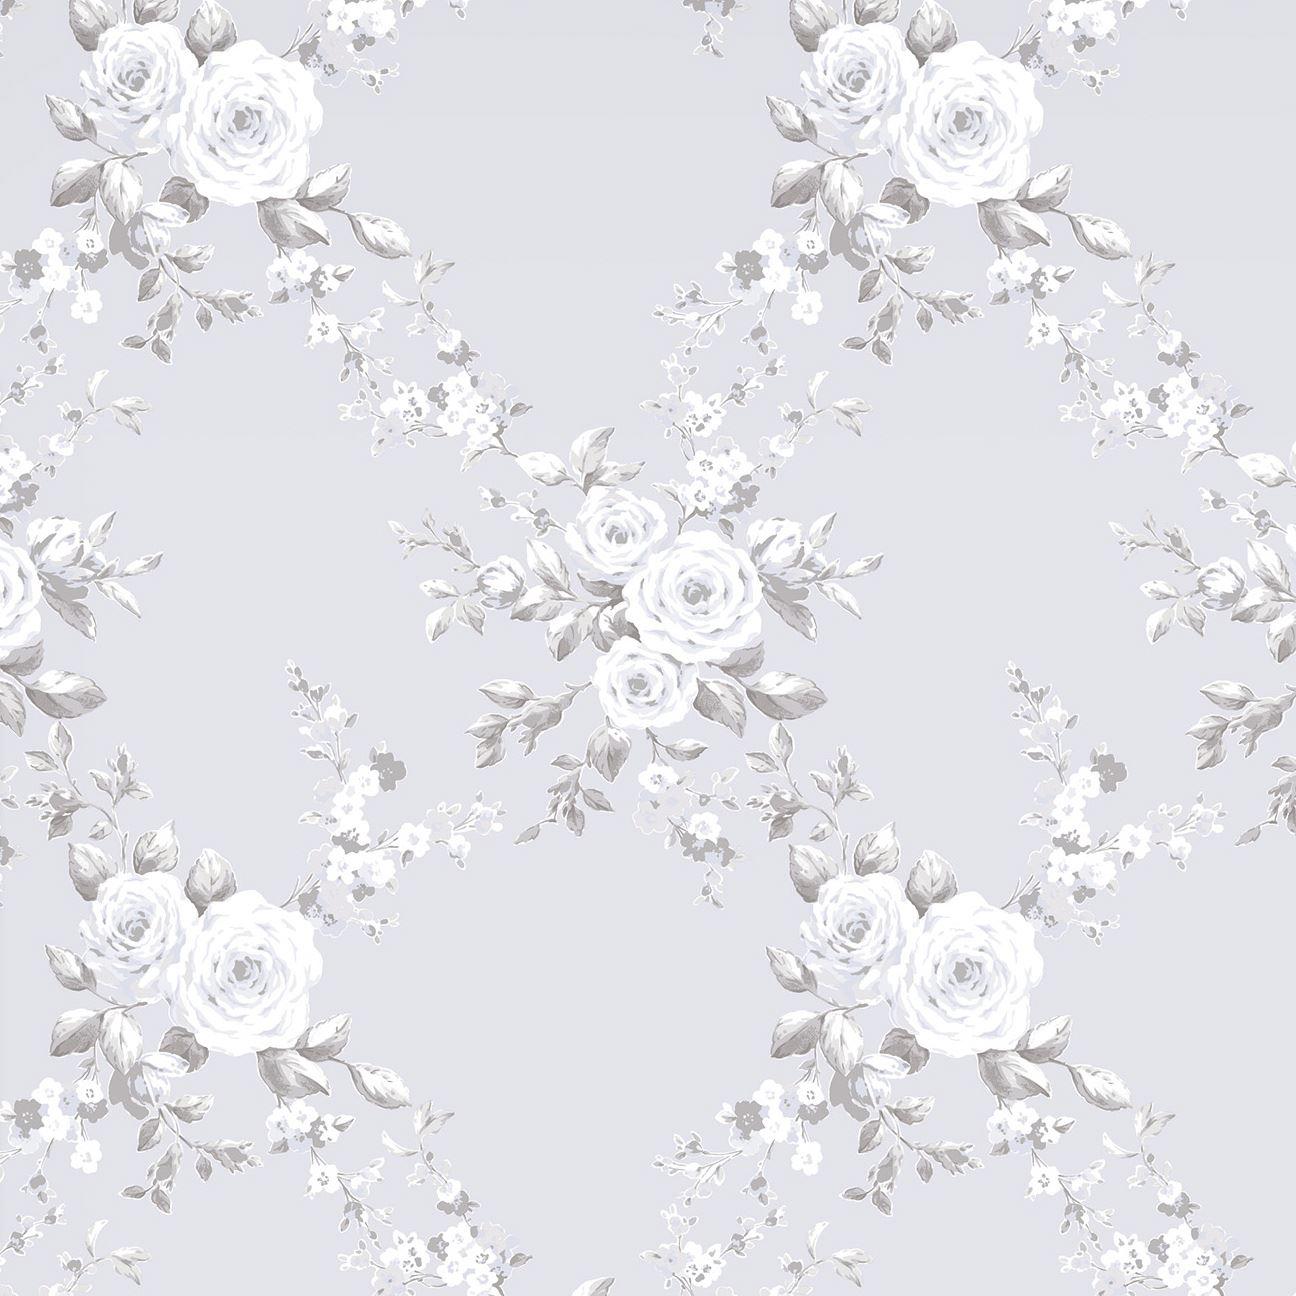 Floral Wallpaper Metallic Glitter Flowers Roses Leaves Blooms